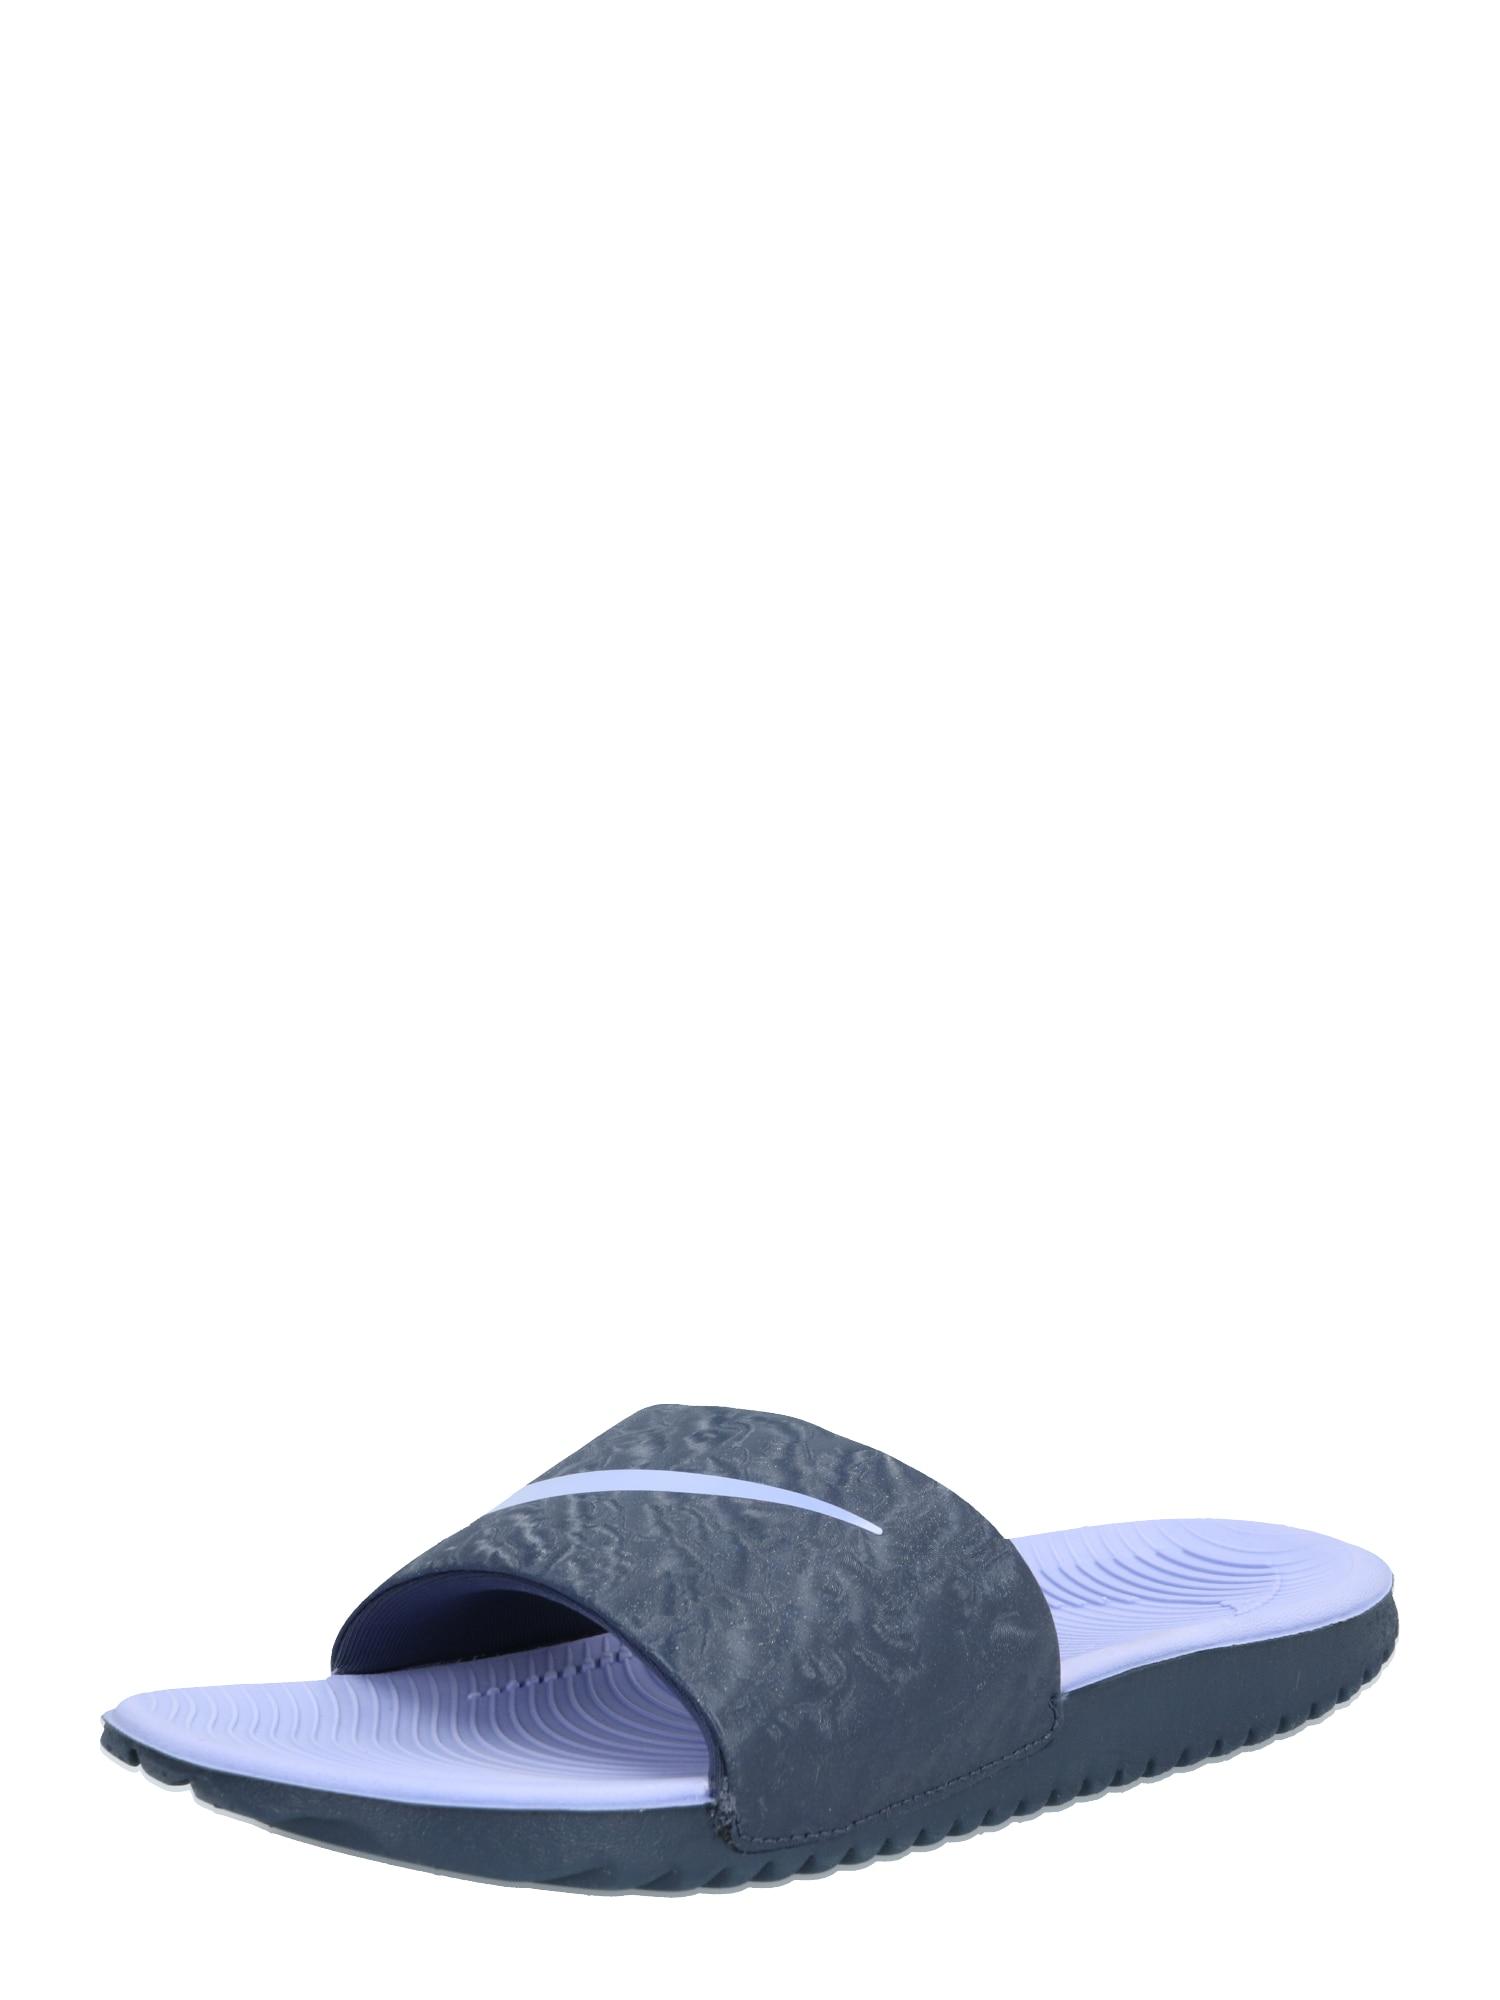 NIKE Sandalai / maudymosi batai 'KAWA' tamsiai pilka / šviesiai mėlyna